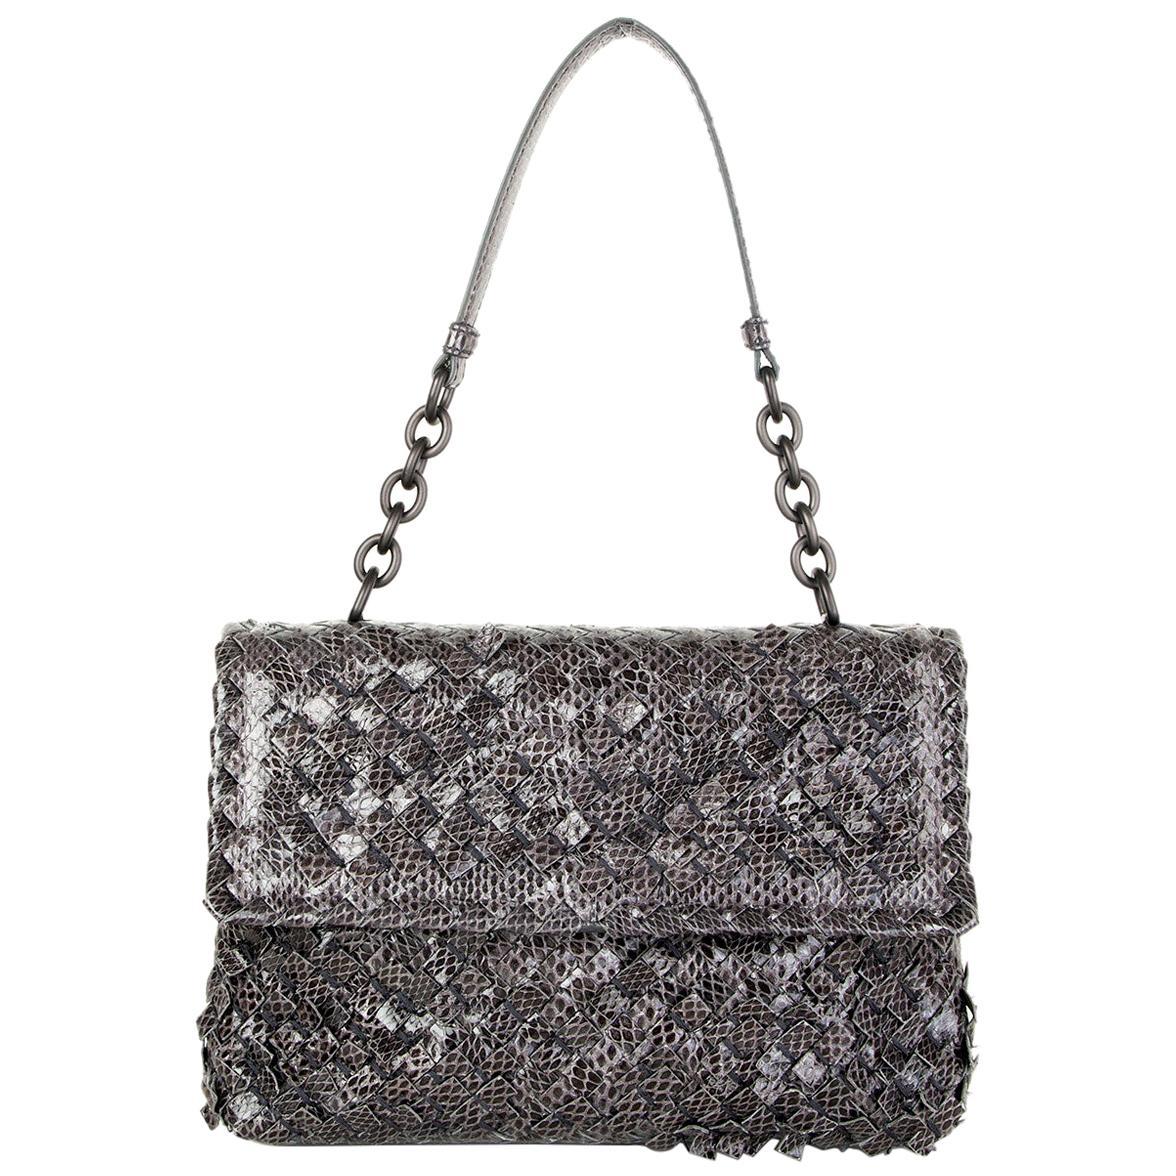 BOTTEGA VENETA grey INTRECCIATO AYERS BABY OLIMPIA Shoulder Bag